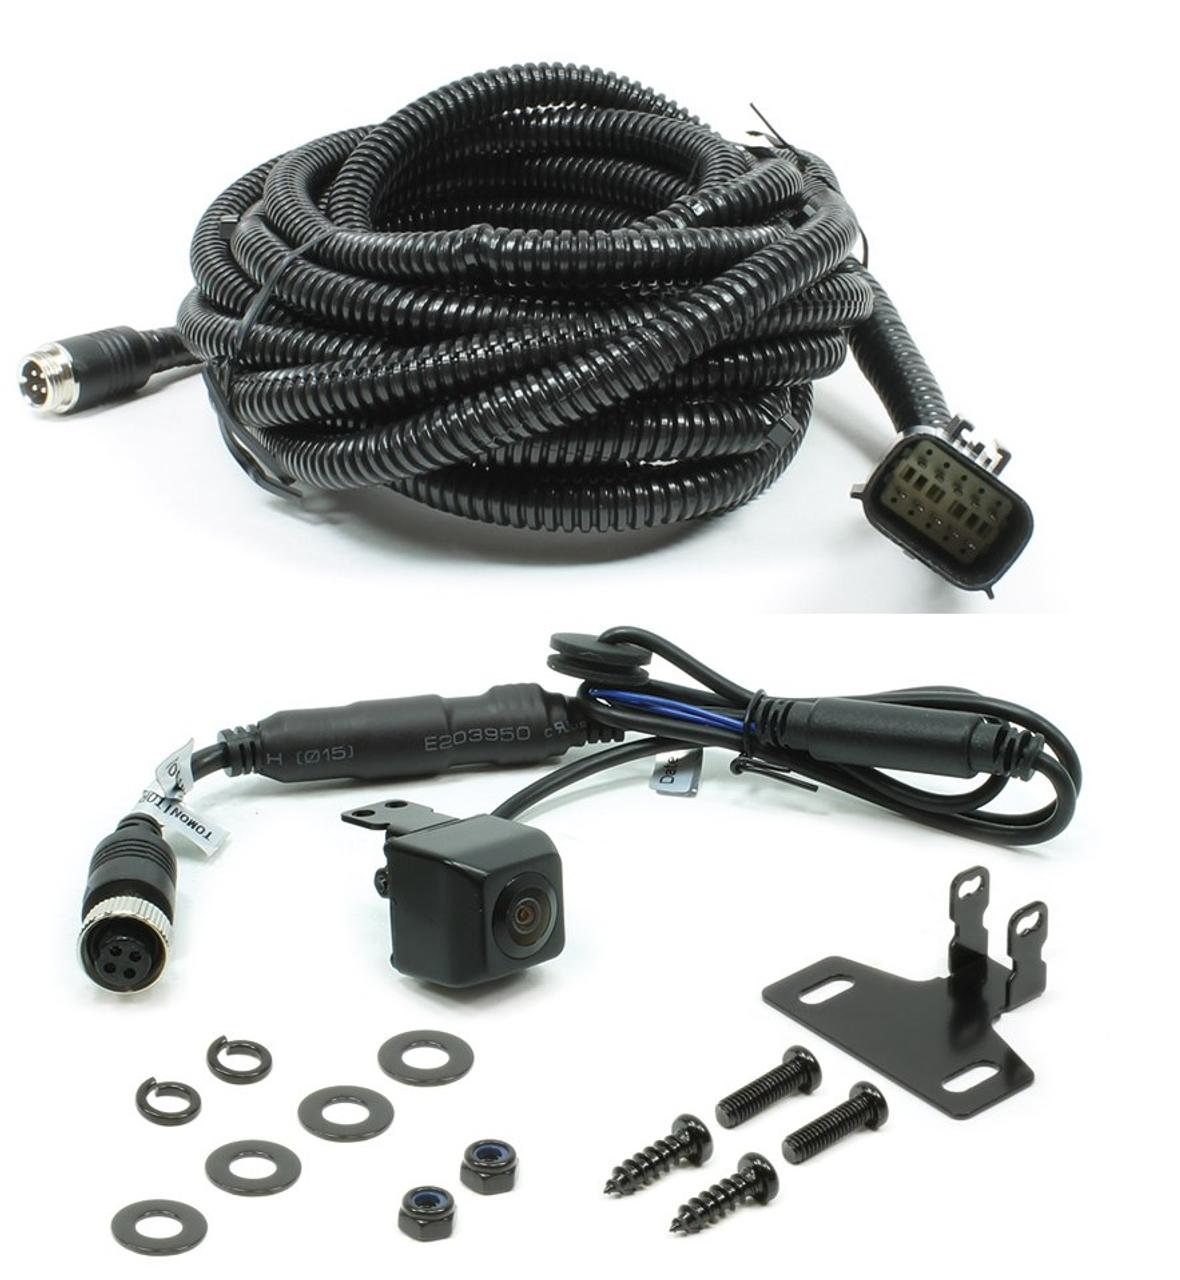 250-8630-tab 2013-2018 ram 1500-3500 tailgate replacement camera kit - m&r  electronics inc